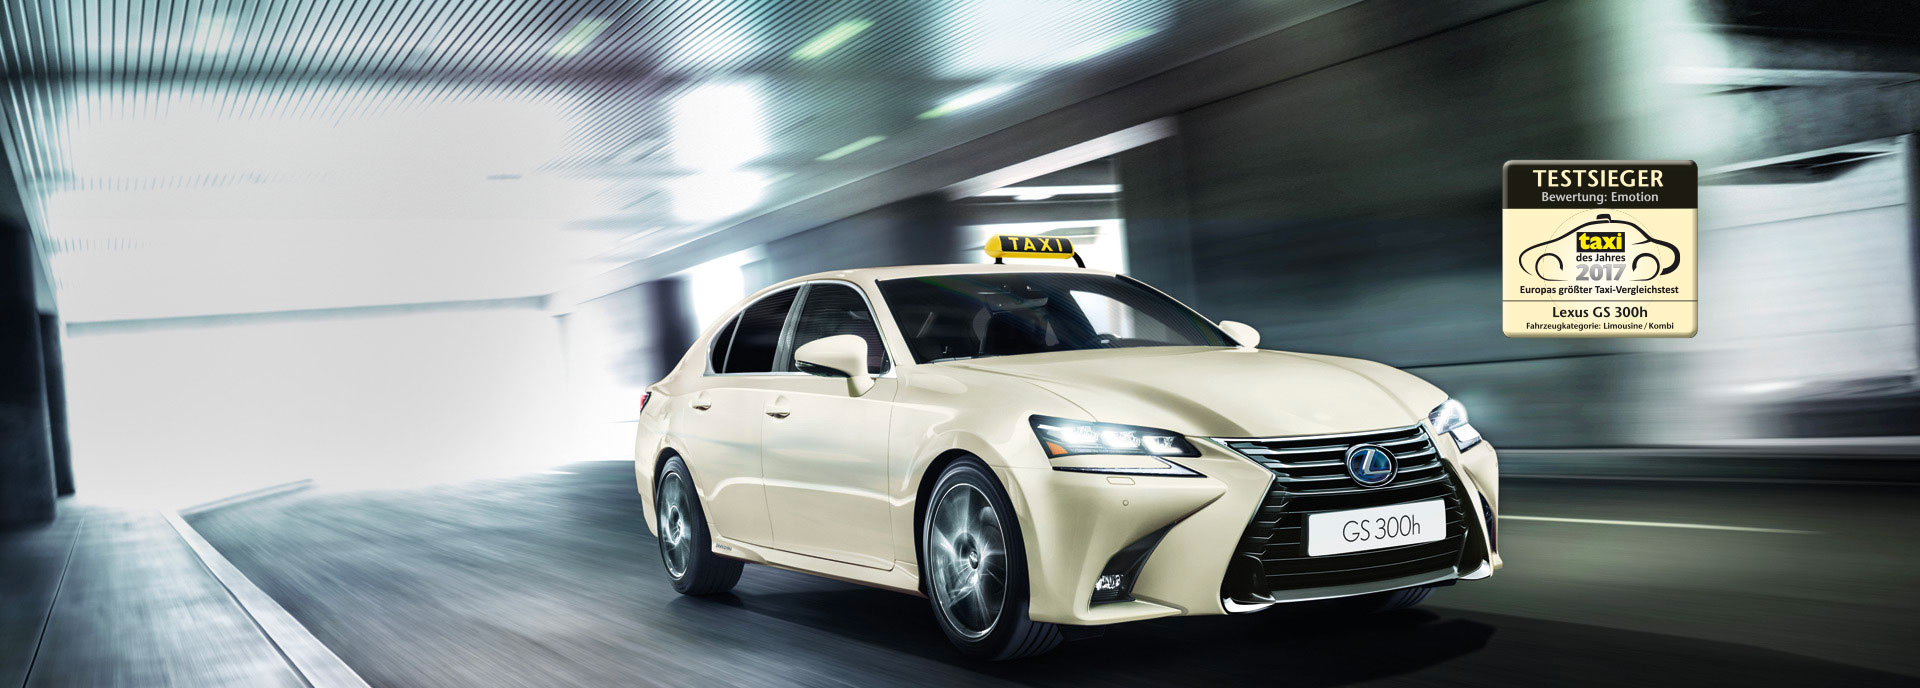 1920x688 taxi 2017